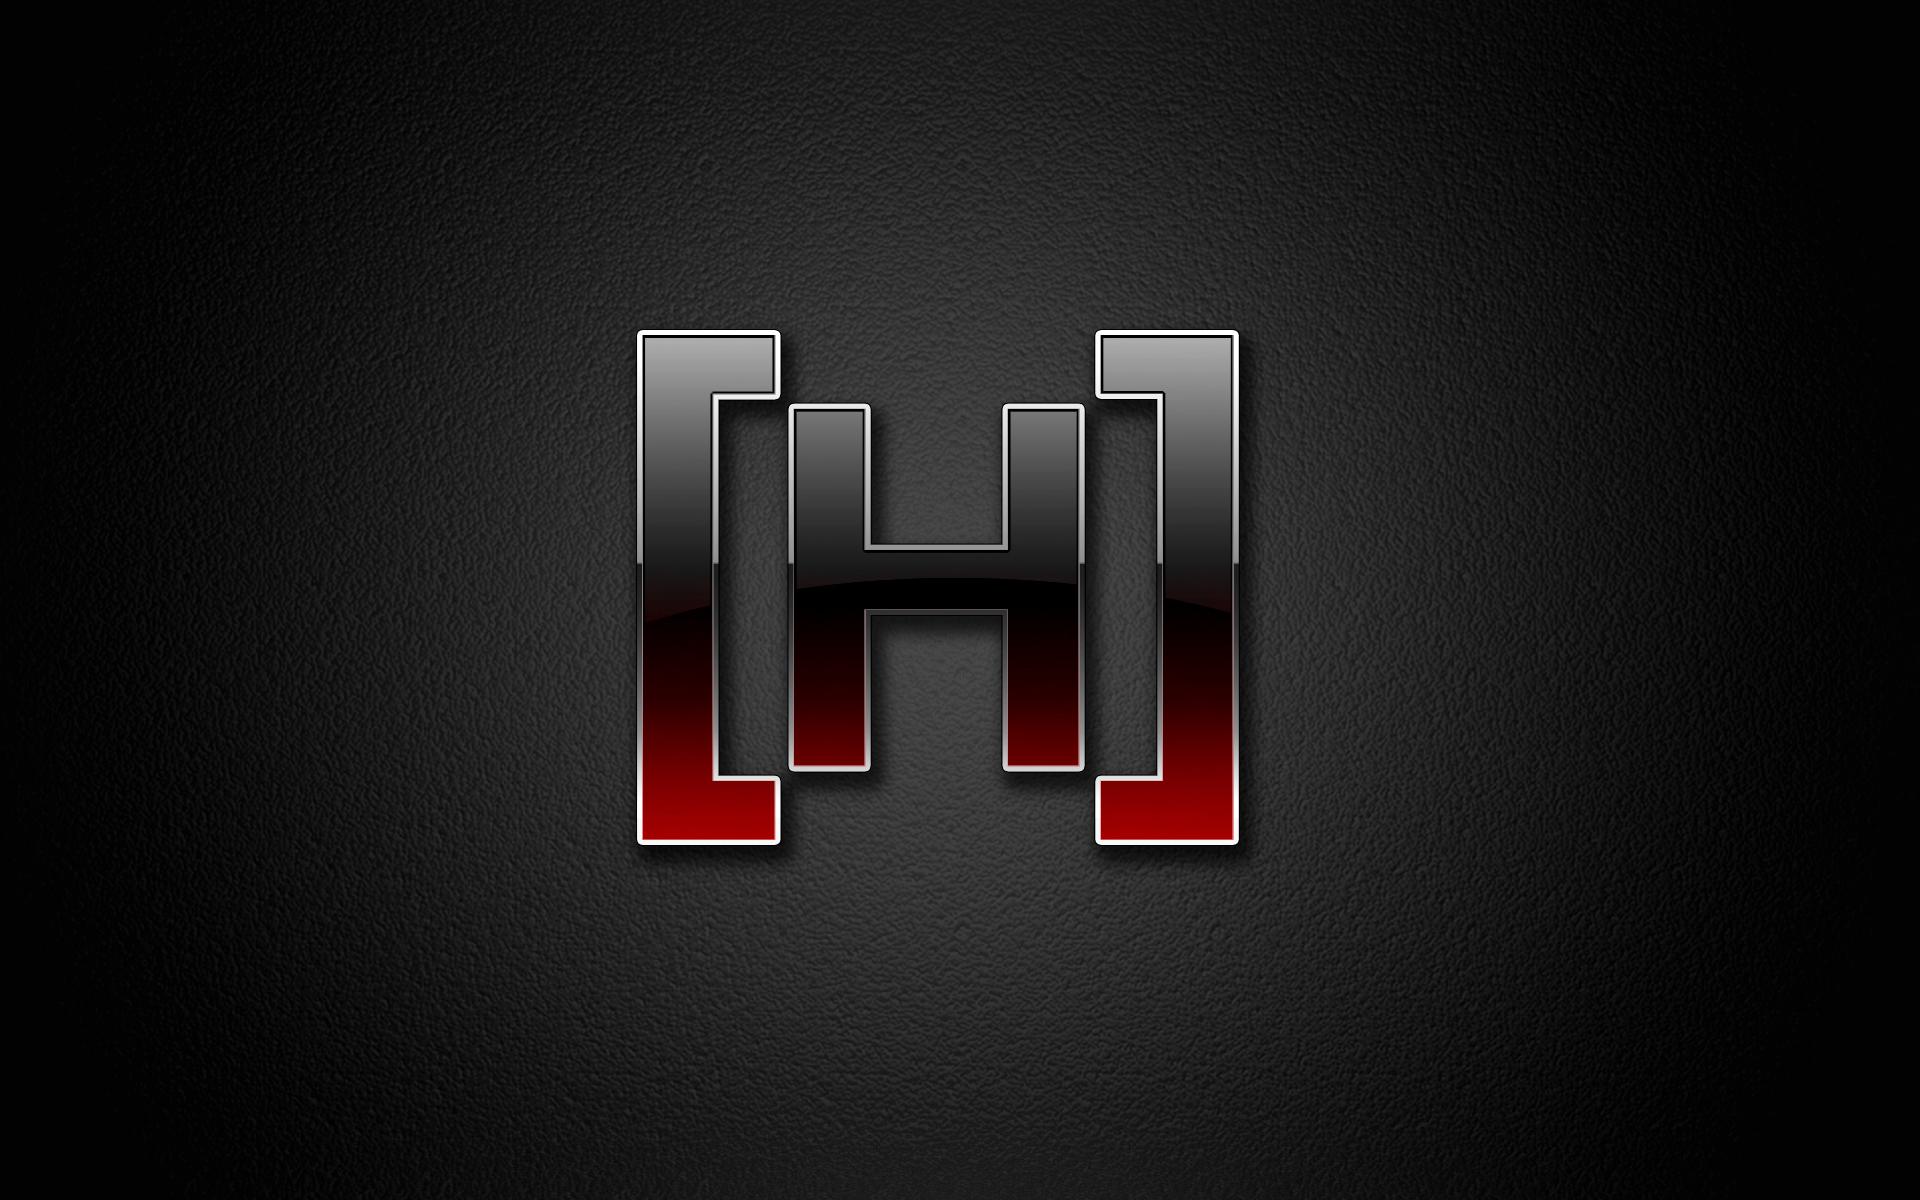 hardocp_by_mullet-d28i2ji.jpg